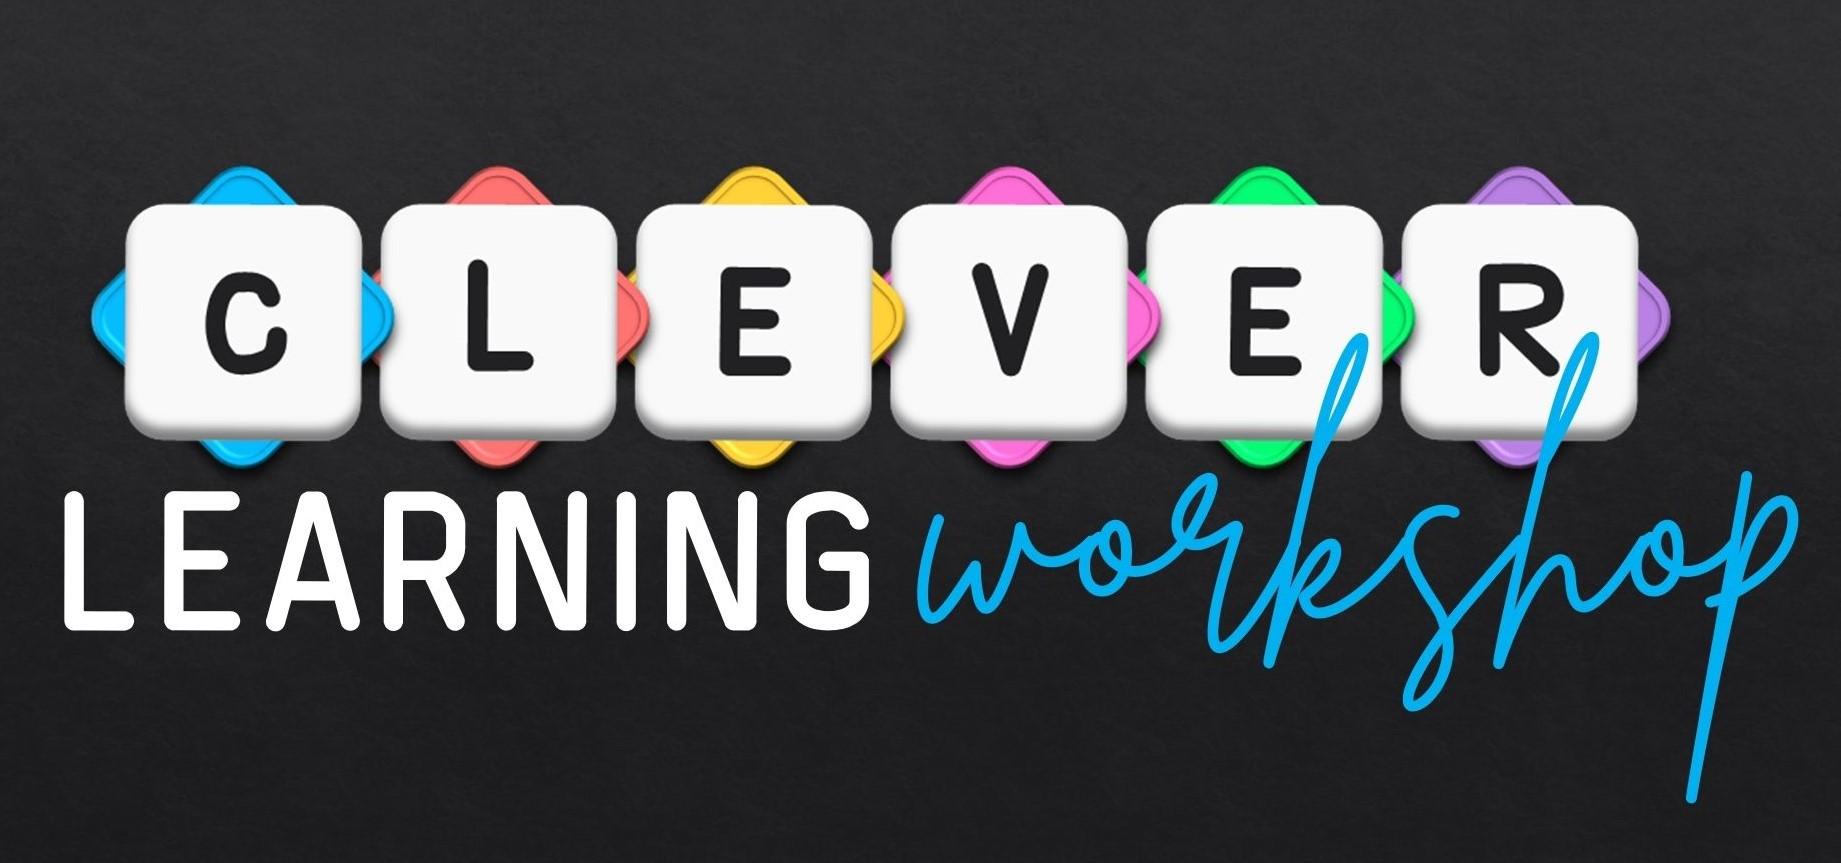 clever learning workshop